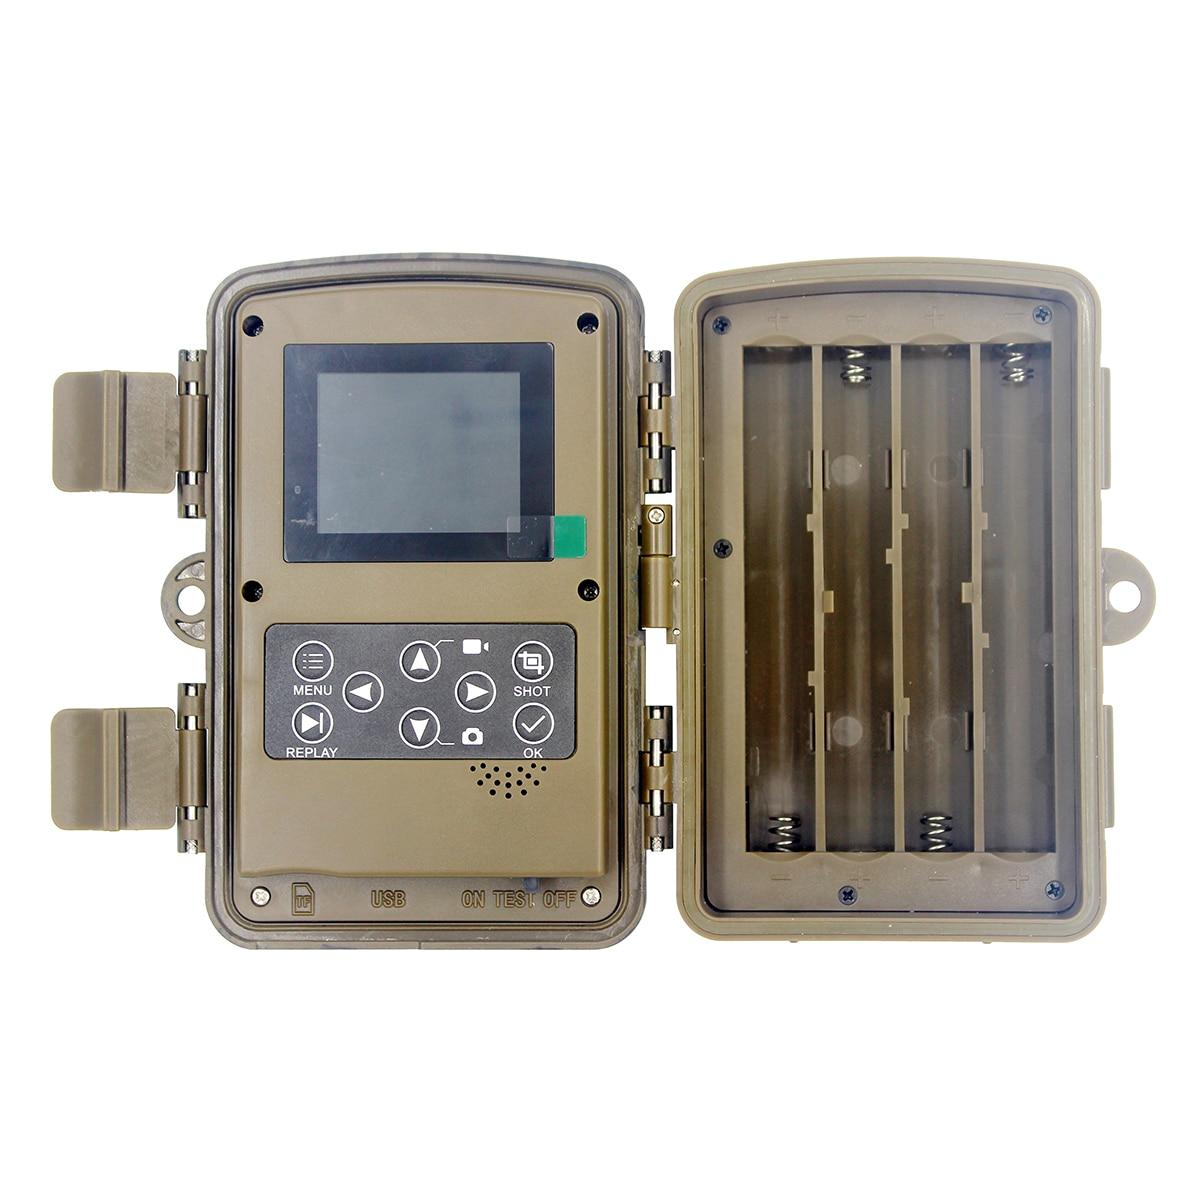 LED كاميرا صيد ليلية الحياة البرية 20MP 1080P الرؤية الليلية في الهواء الطلق الصيد Vamera Trail 1080P HD الحياة البرية الحيوان كاميرا فيديو